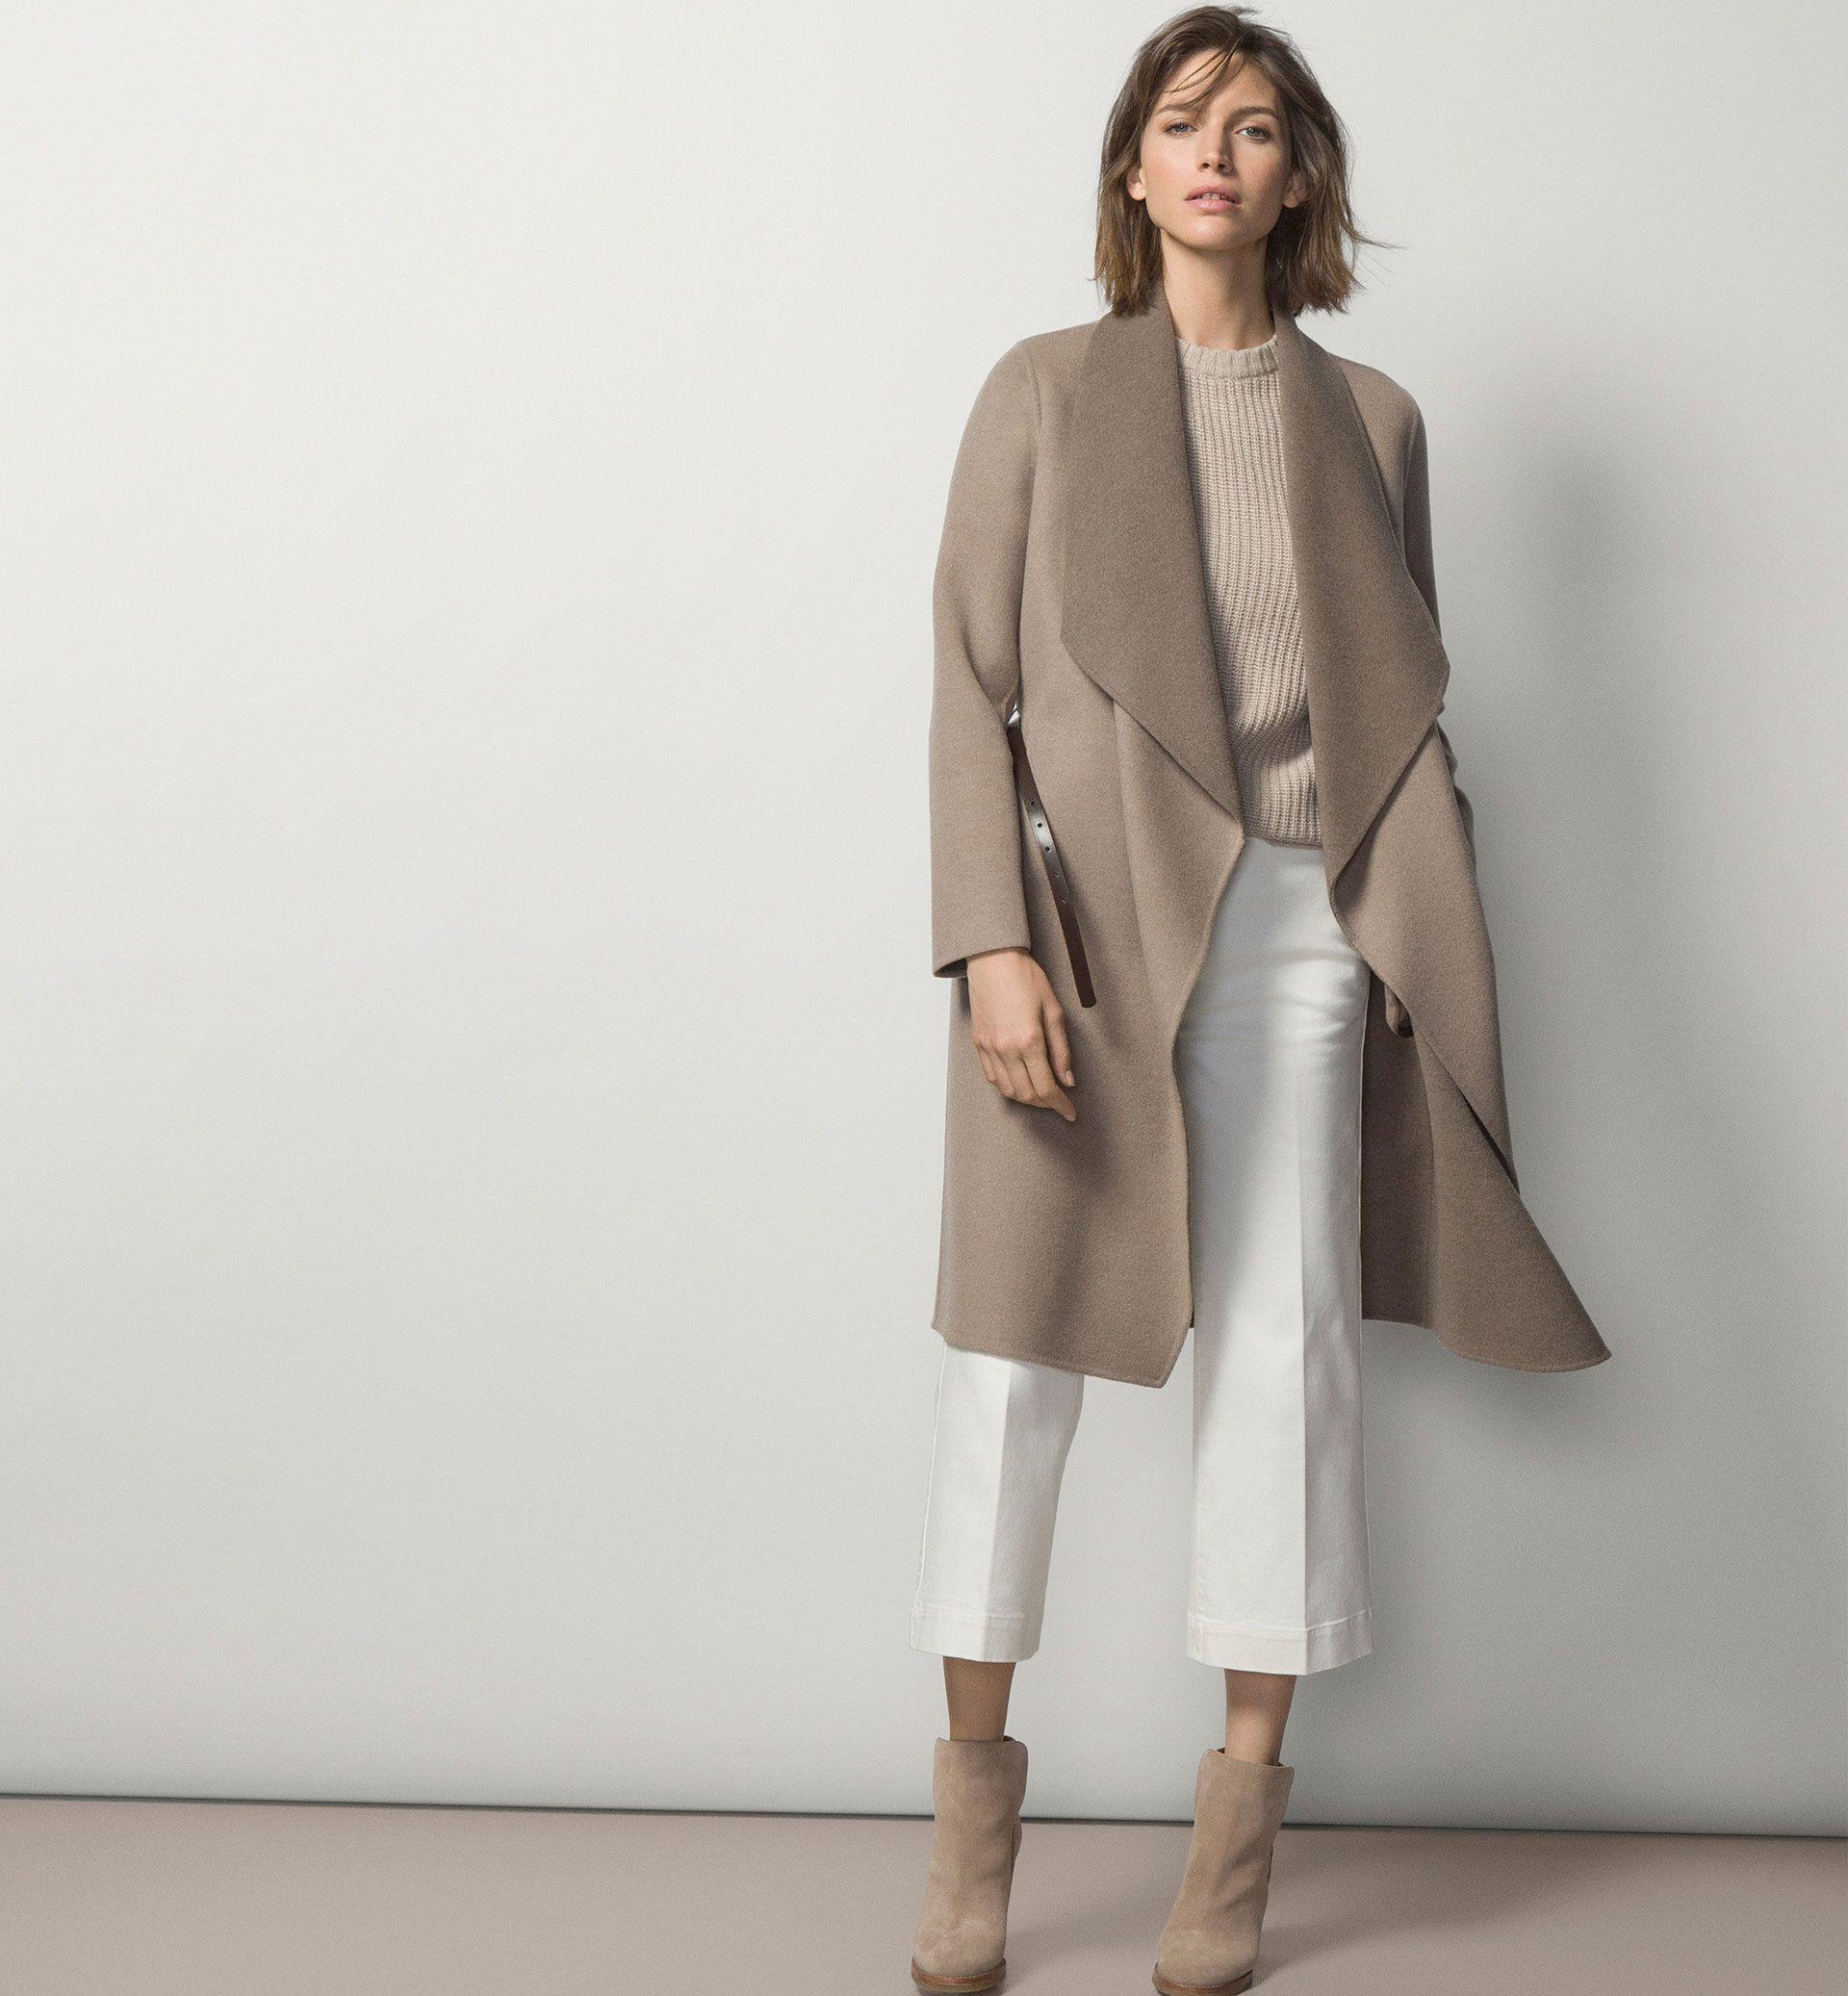 LONG TWO-TONE COAT - Coats - WOMEN - United States - Massimo Dutti